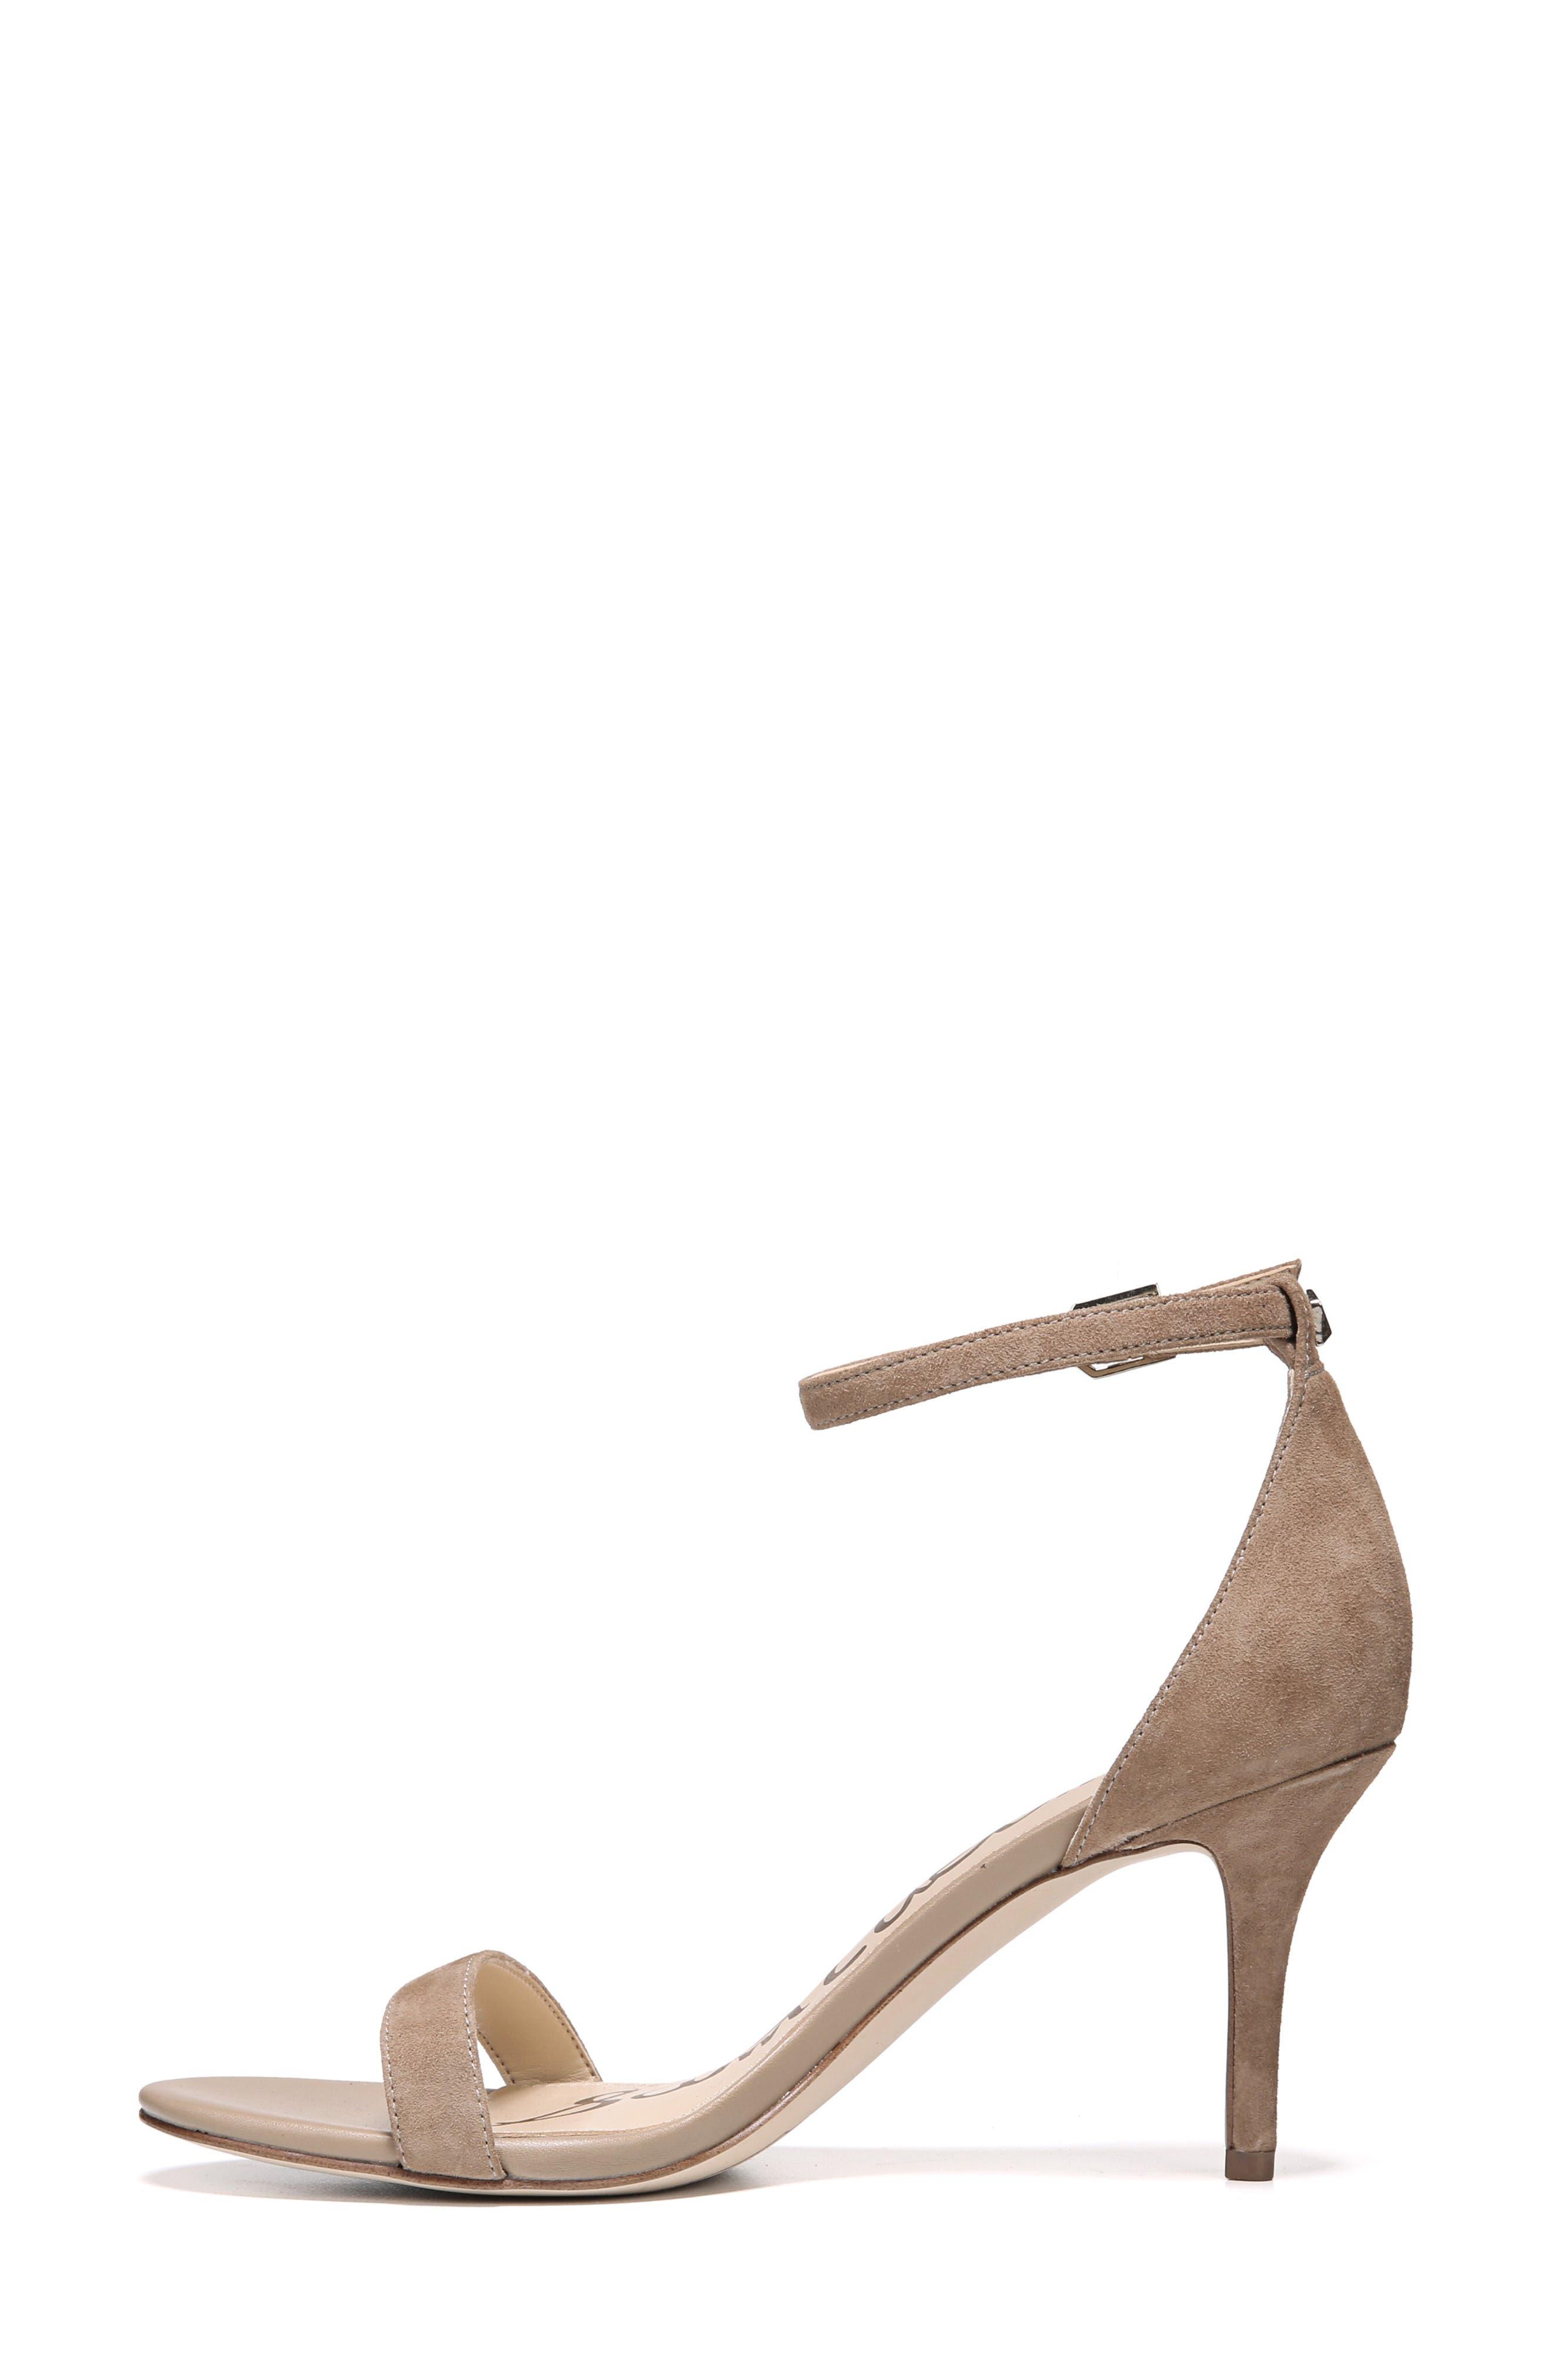 ,                             'Patti' Ankle Strap Sandal,                             Alternate thumbnail 90, color,                             254